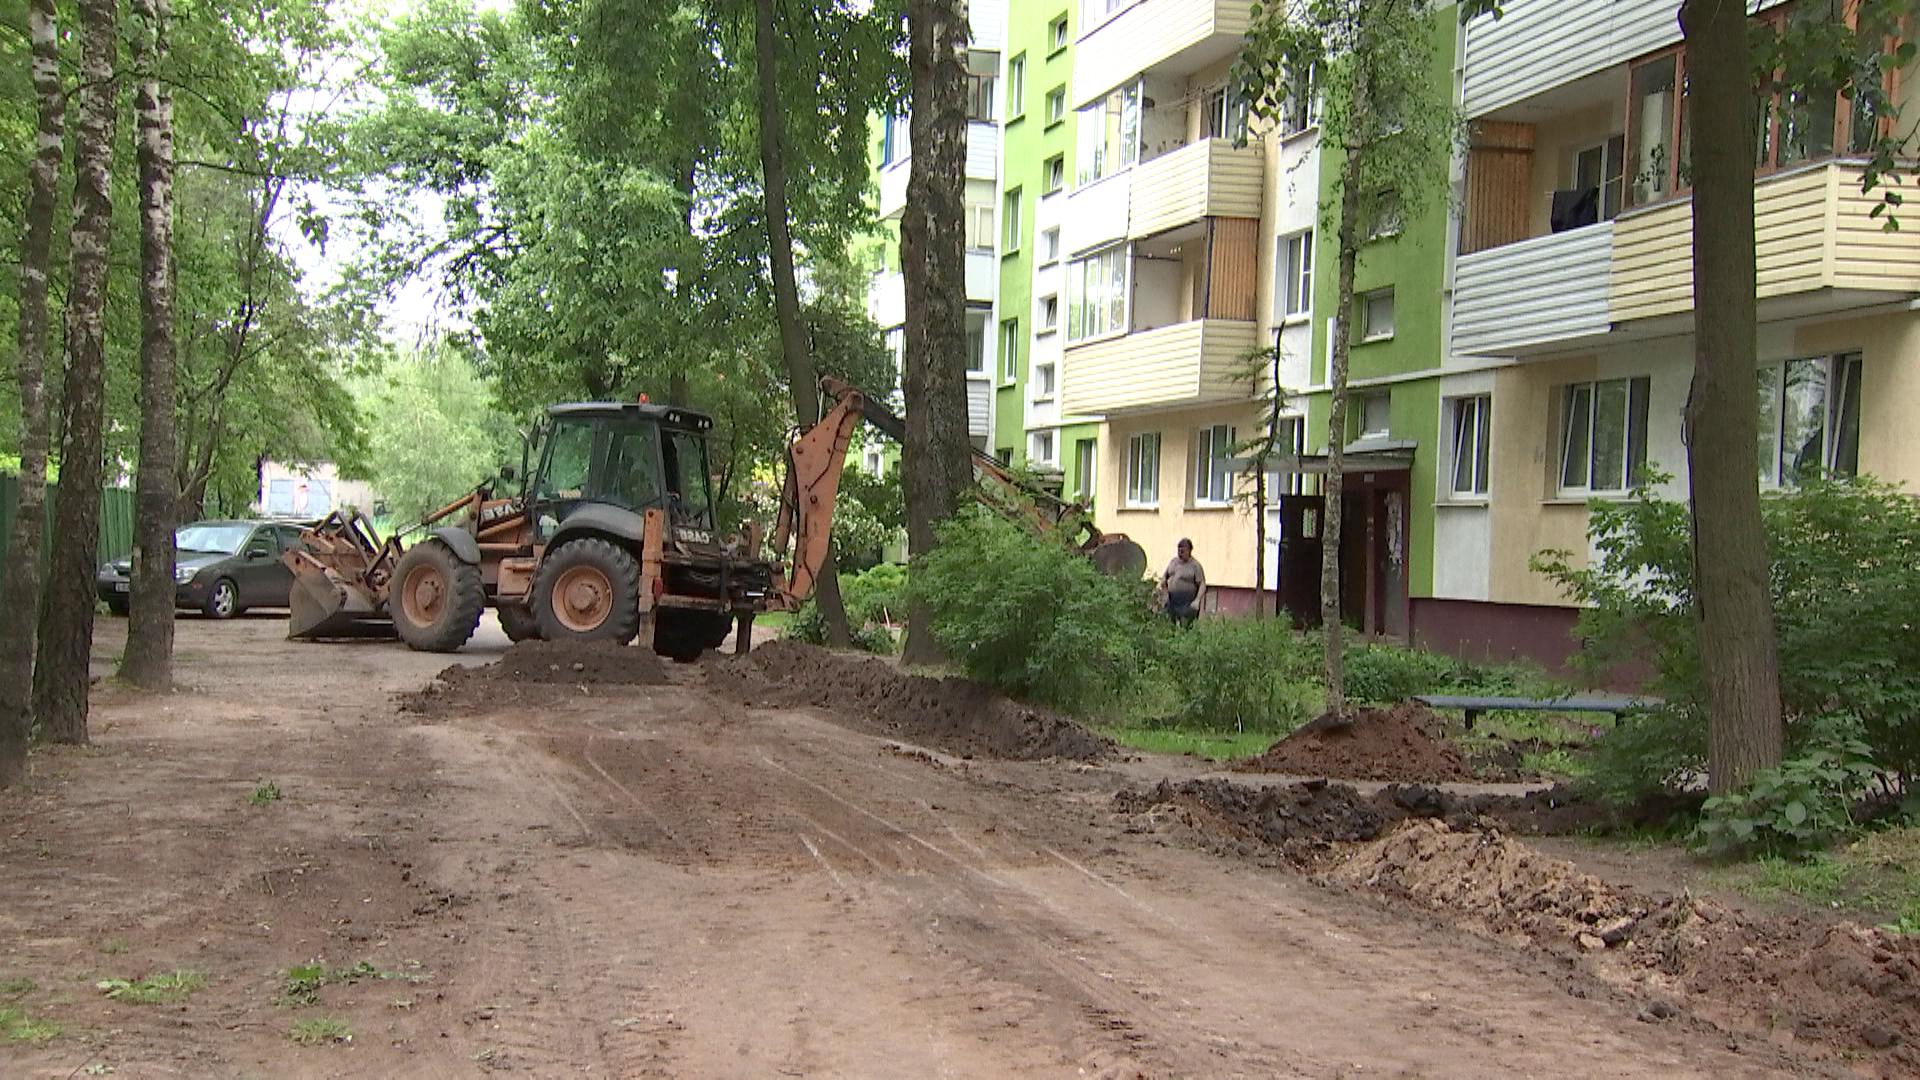 zhkh polock - Модернизация уличного освещения и благоустройство Полоцка (видео)